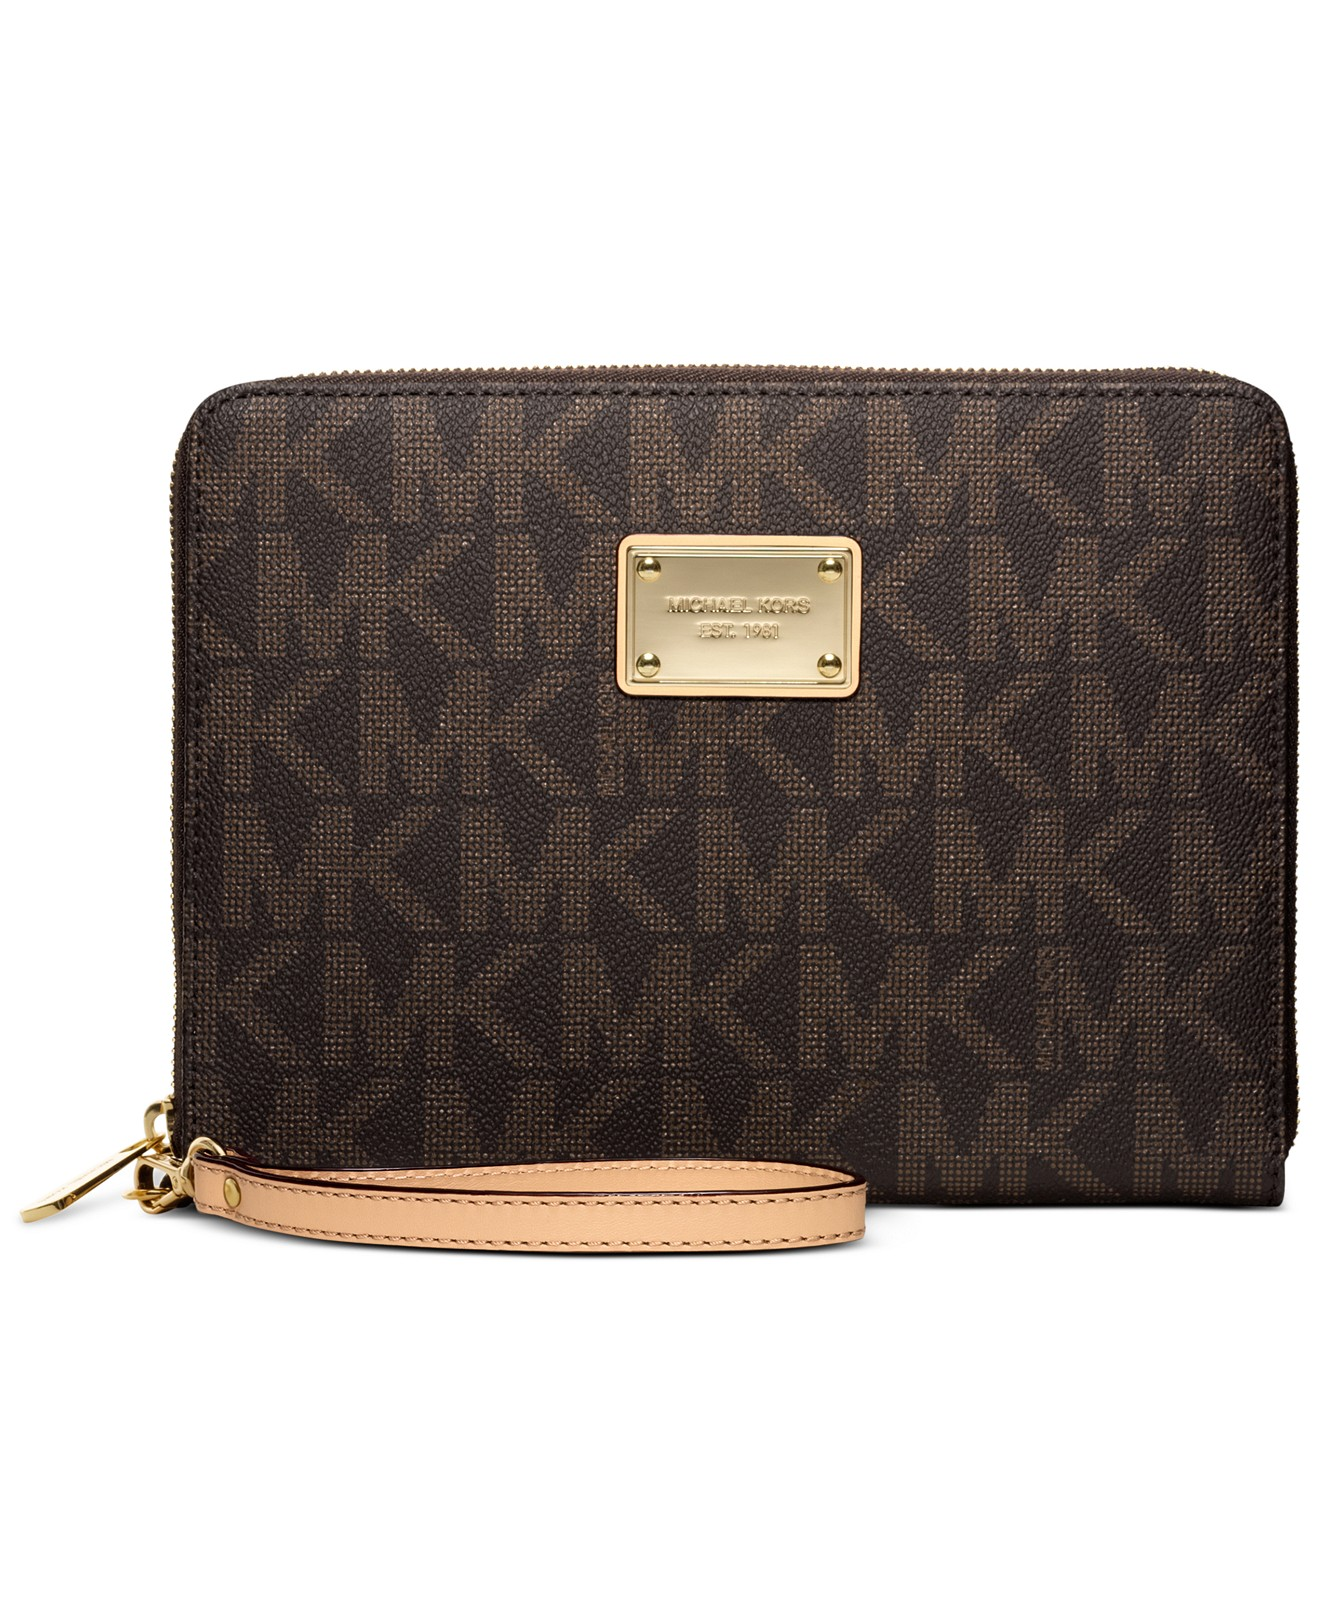 MICHAEL Michael Kors Mini Multi Function Tablet Case Reviews - Handbags Accessories - Macy's